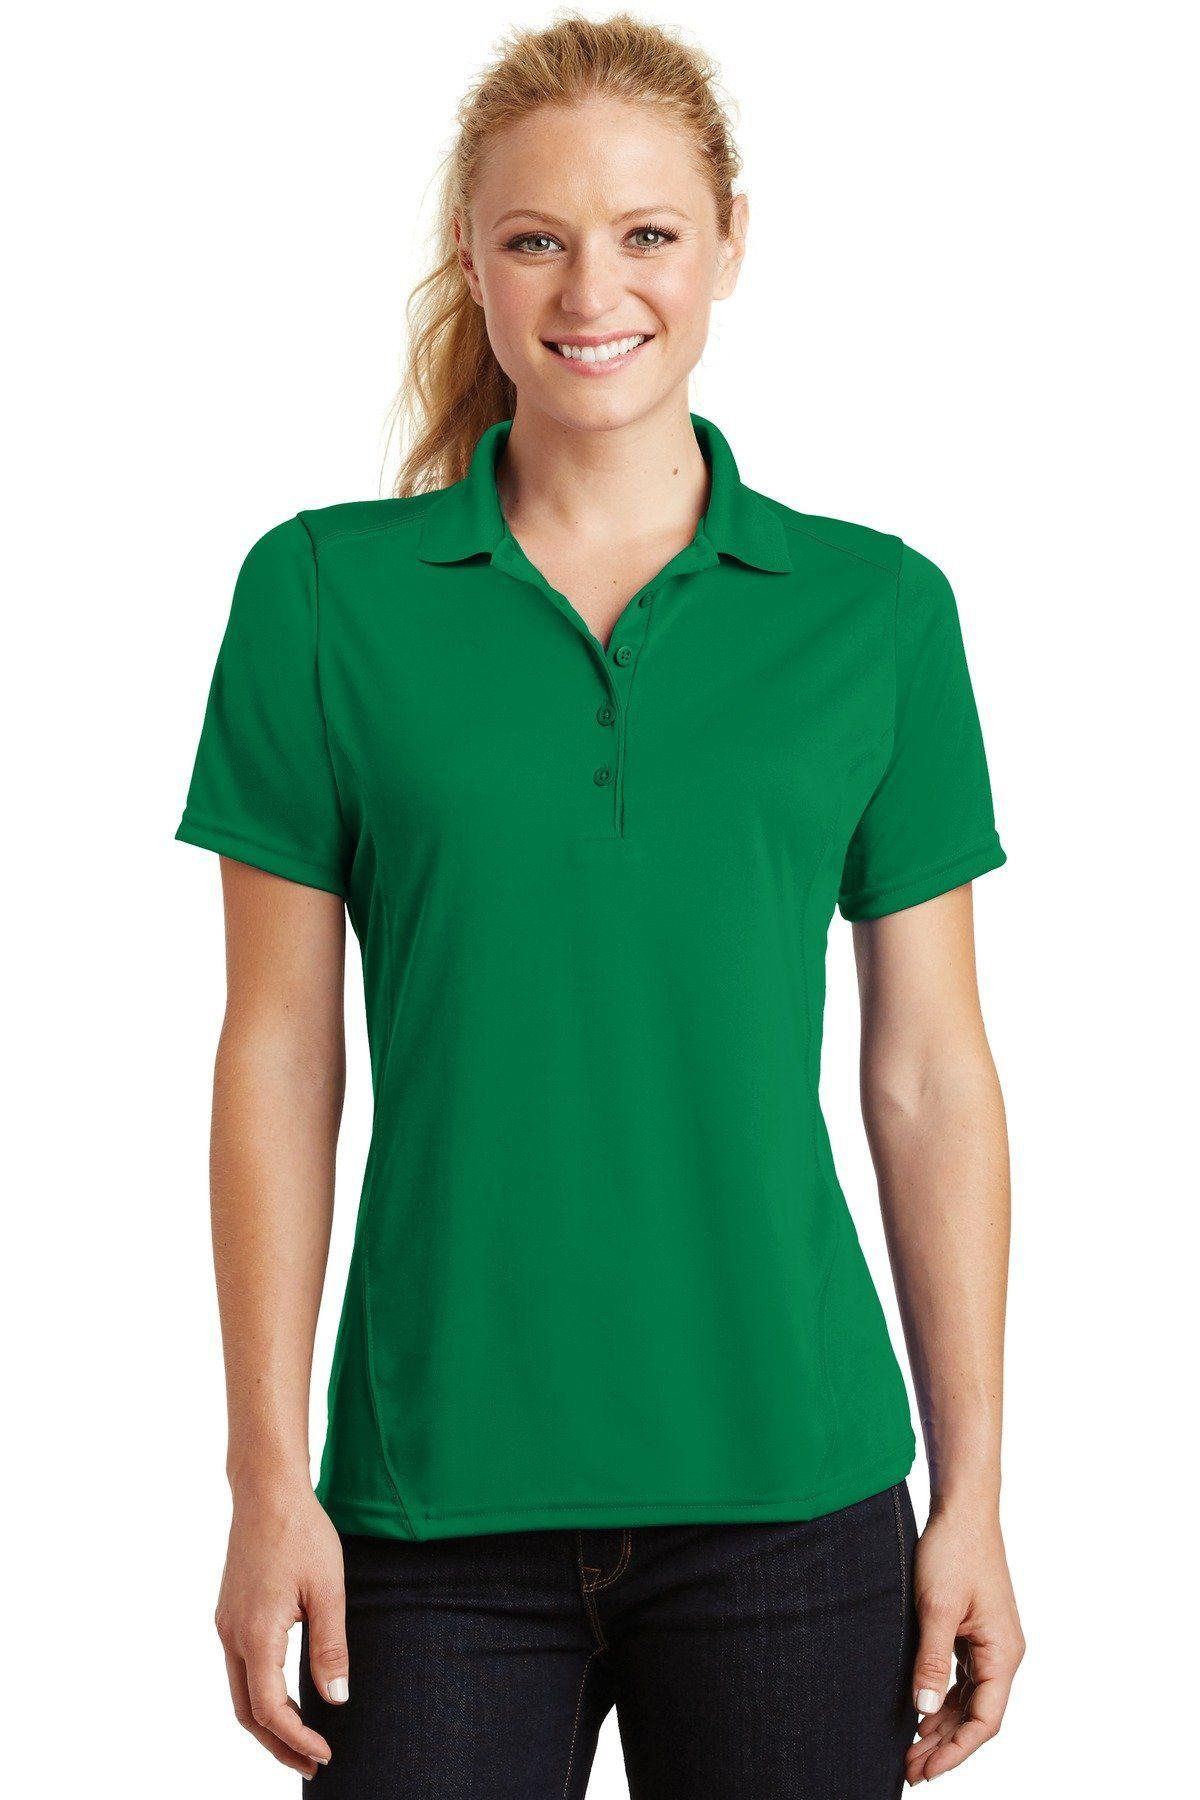 SportTek Ladies Dry Zone Raglan Accent Polo L475 Kelly